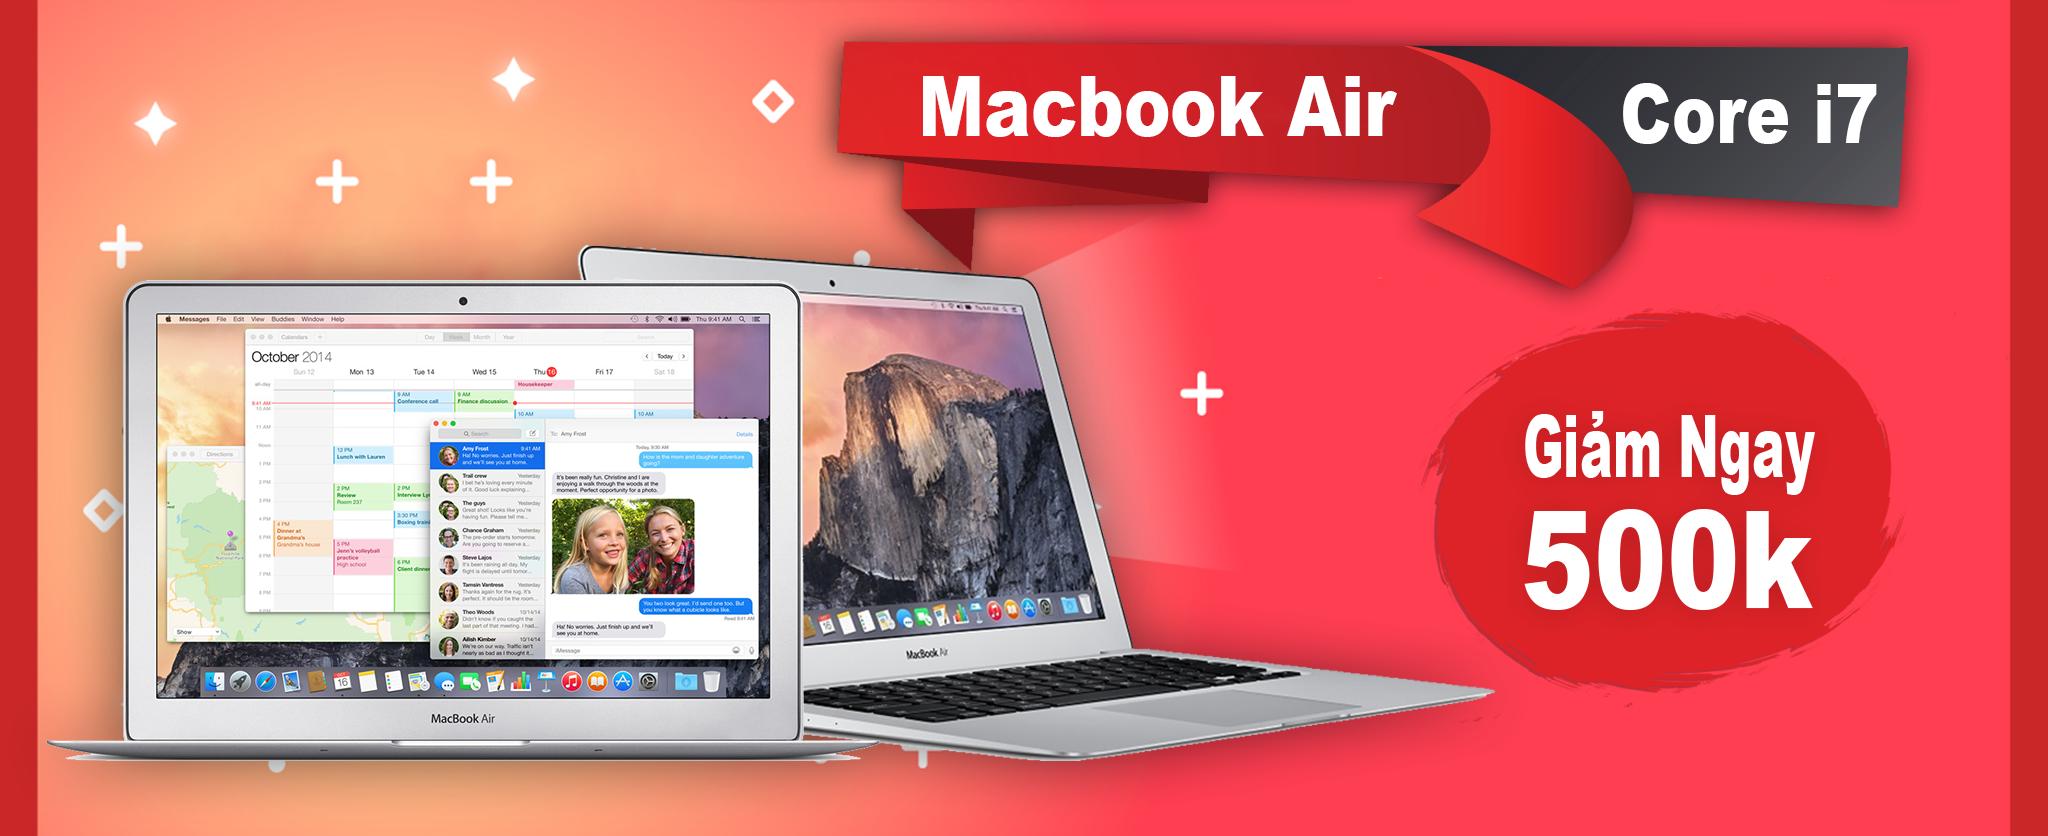 Mua Macbook Air cũ 13 inch 2014-2015 giá cực rẻ